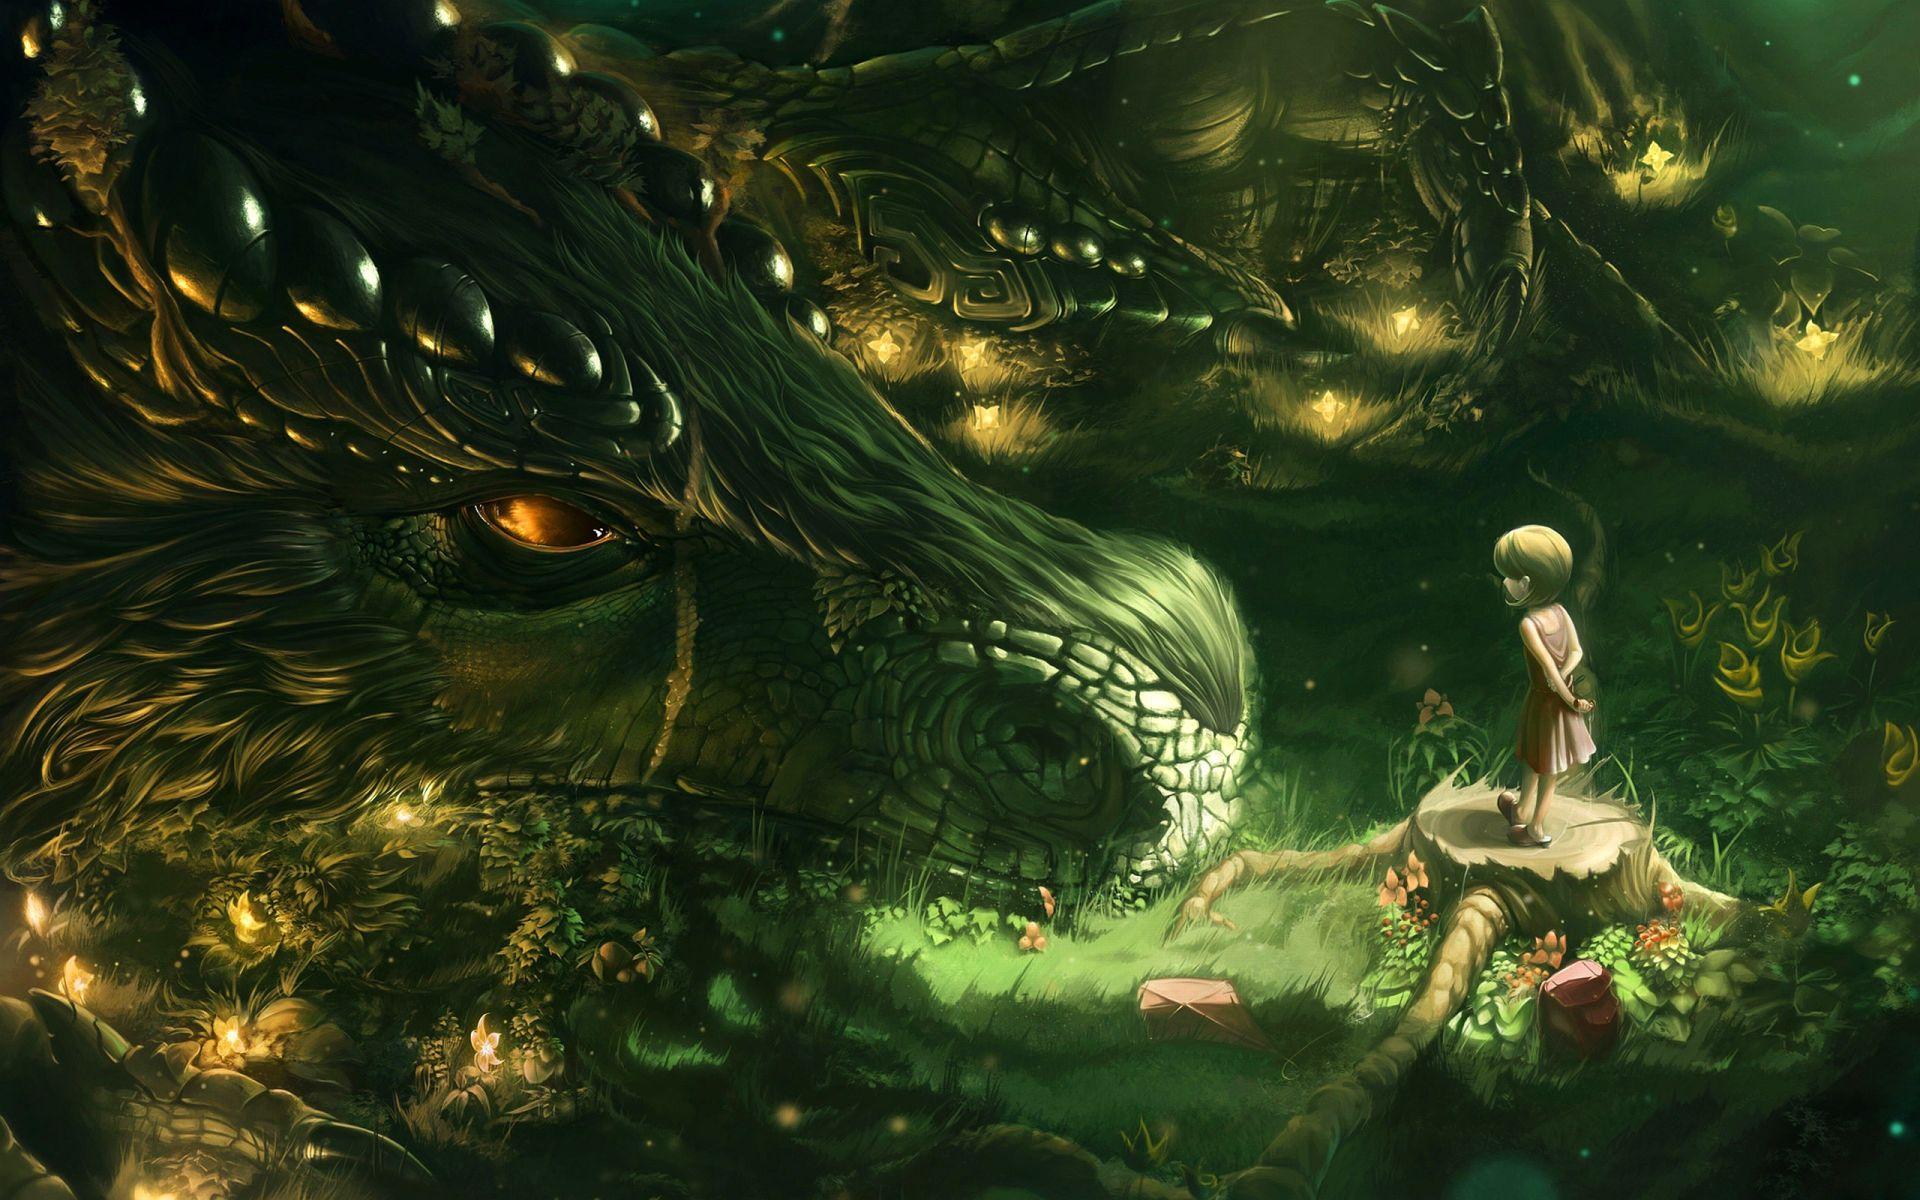 dragon wallpaper art